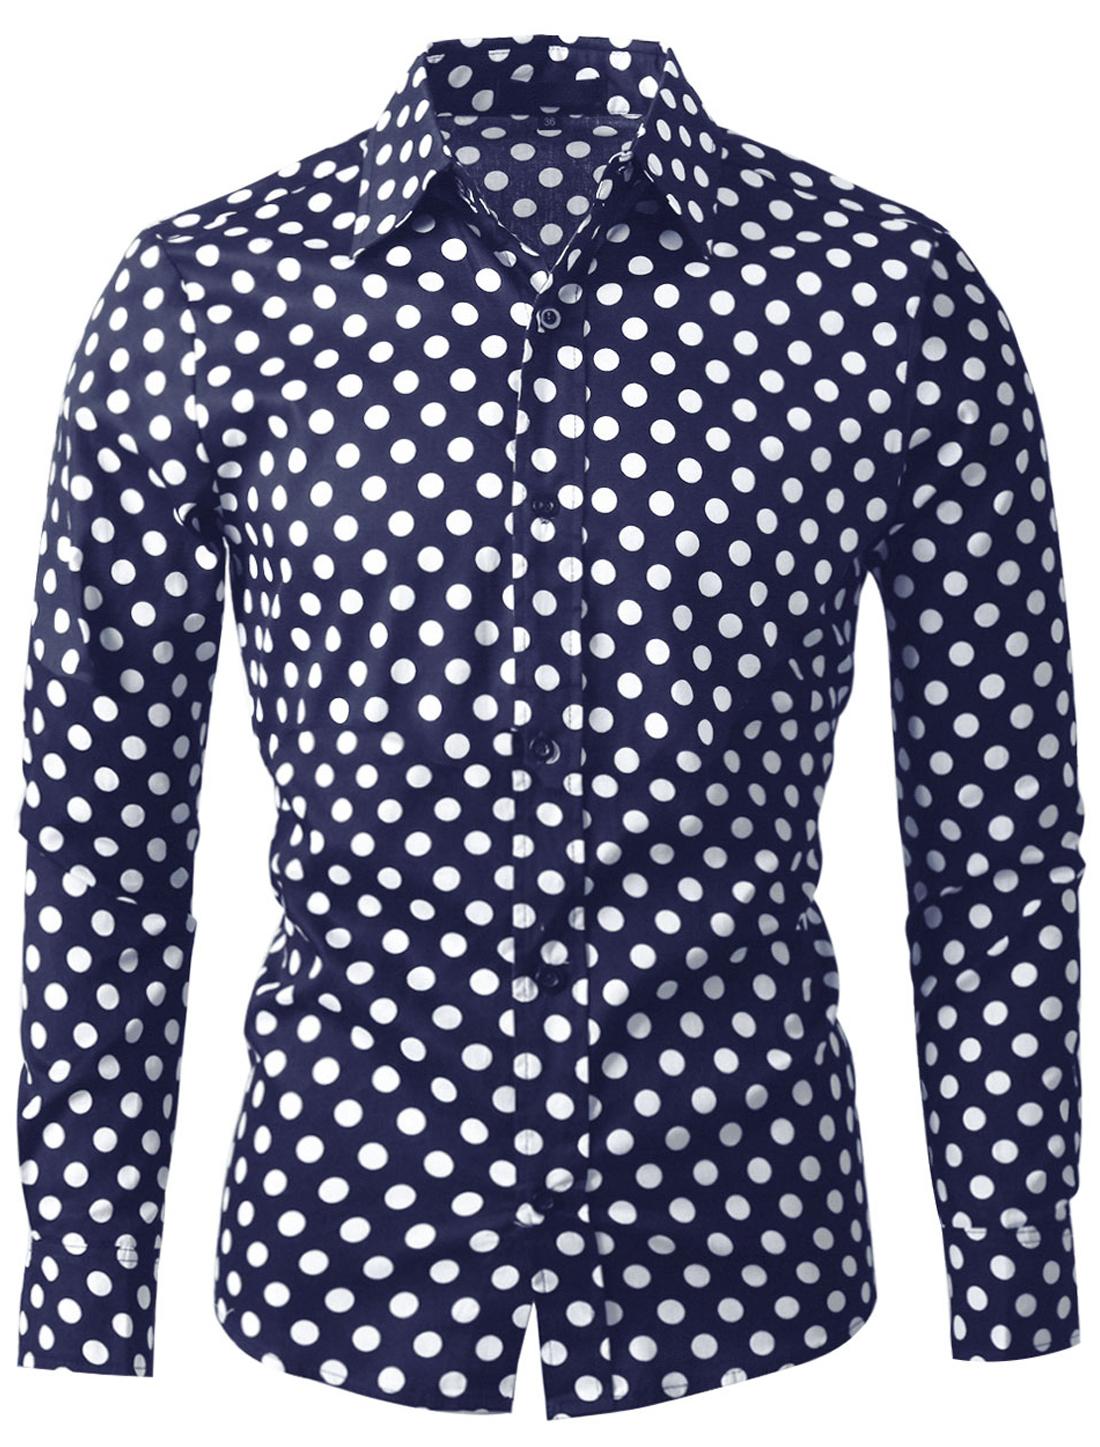 Men 100% Cotton Polka Dots Long Sleeve Slim Fit Dress Shirt Navy Blue 34